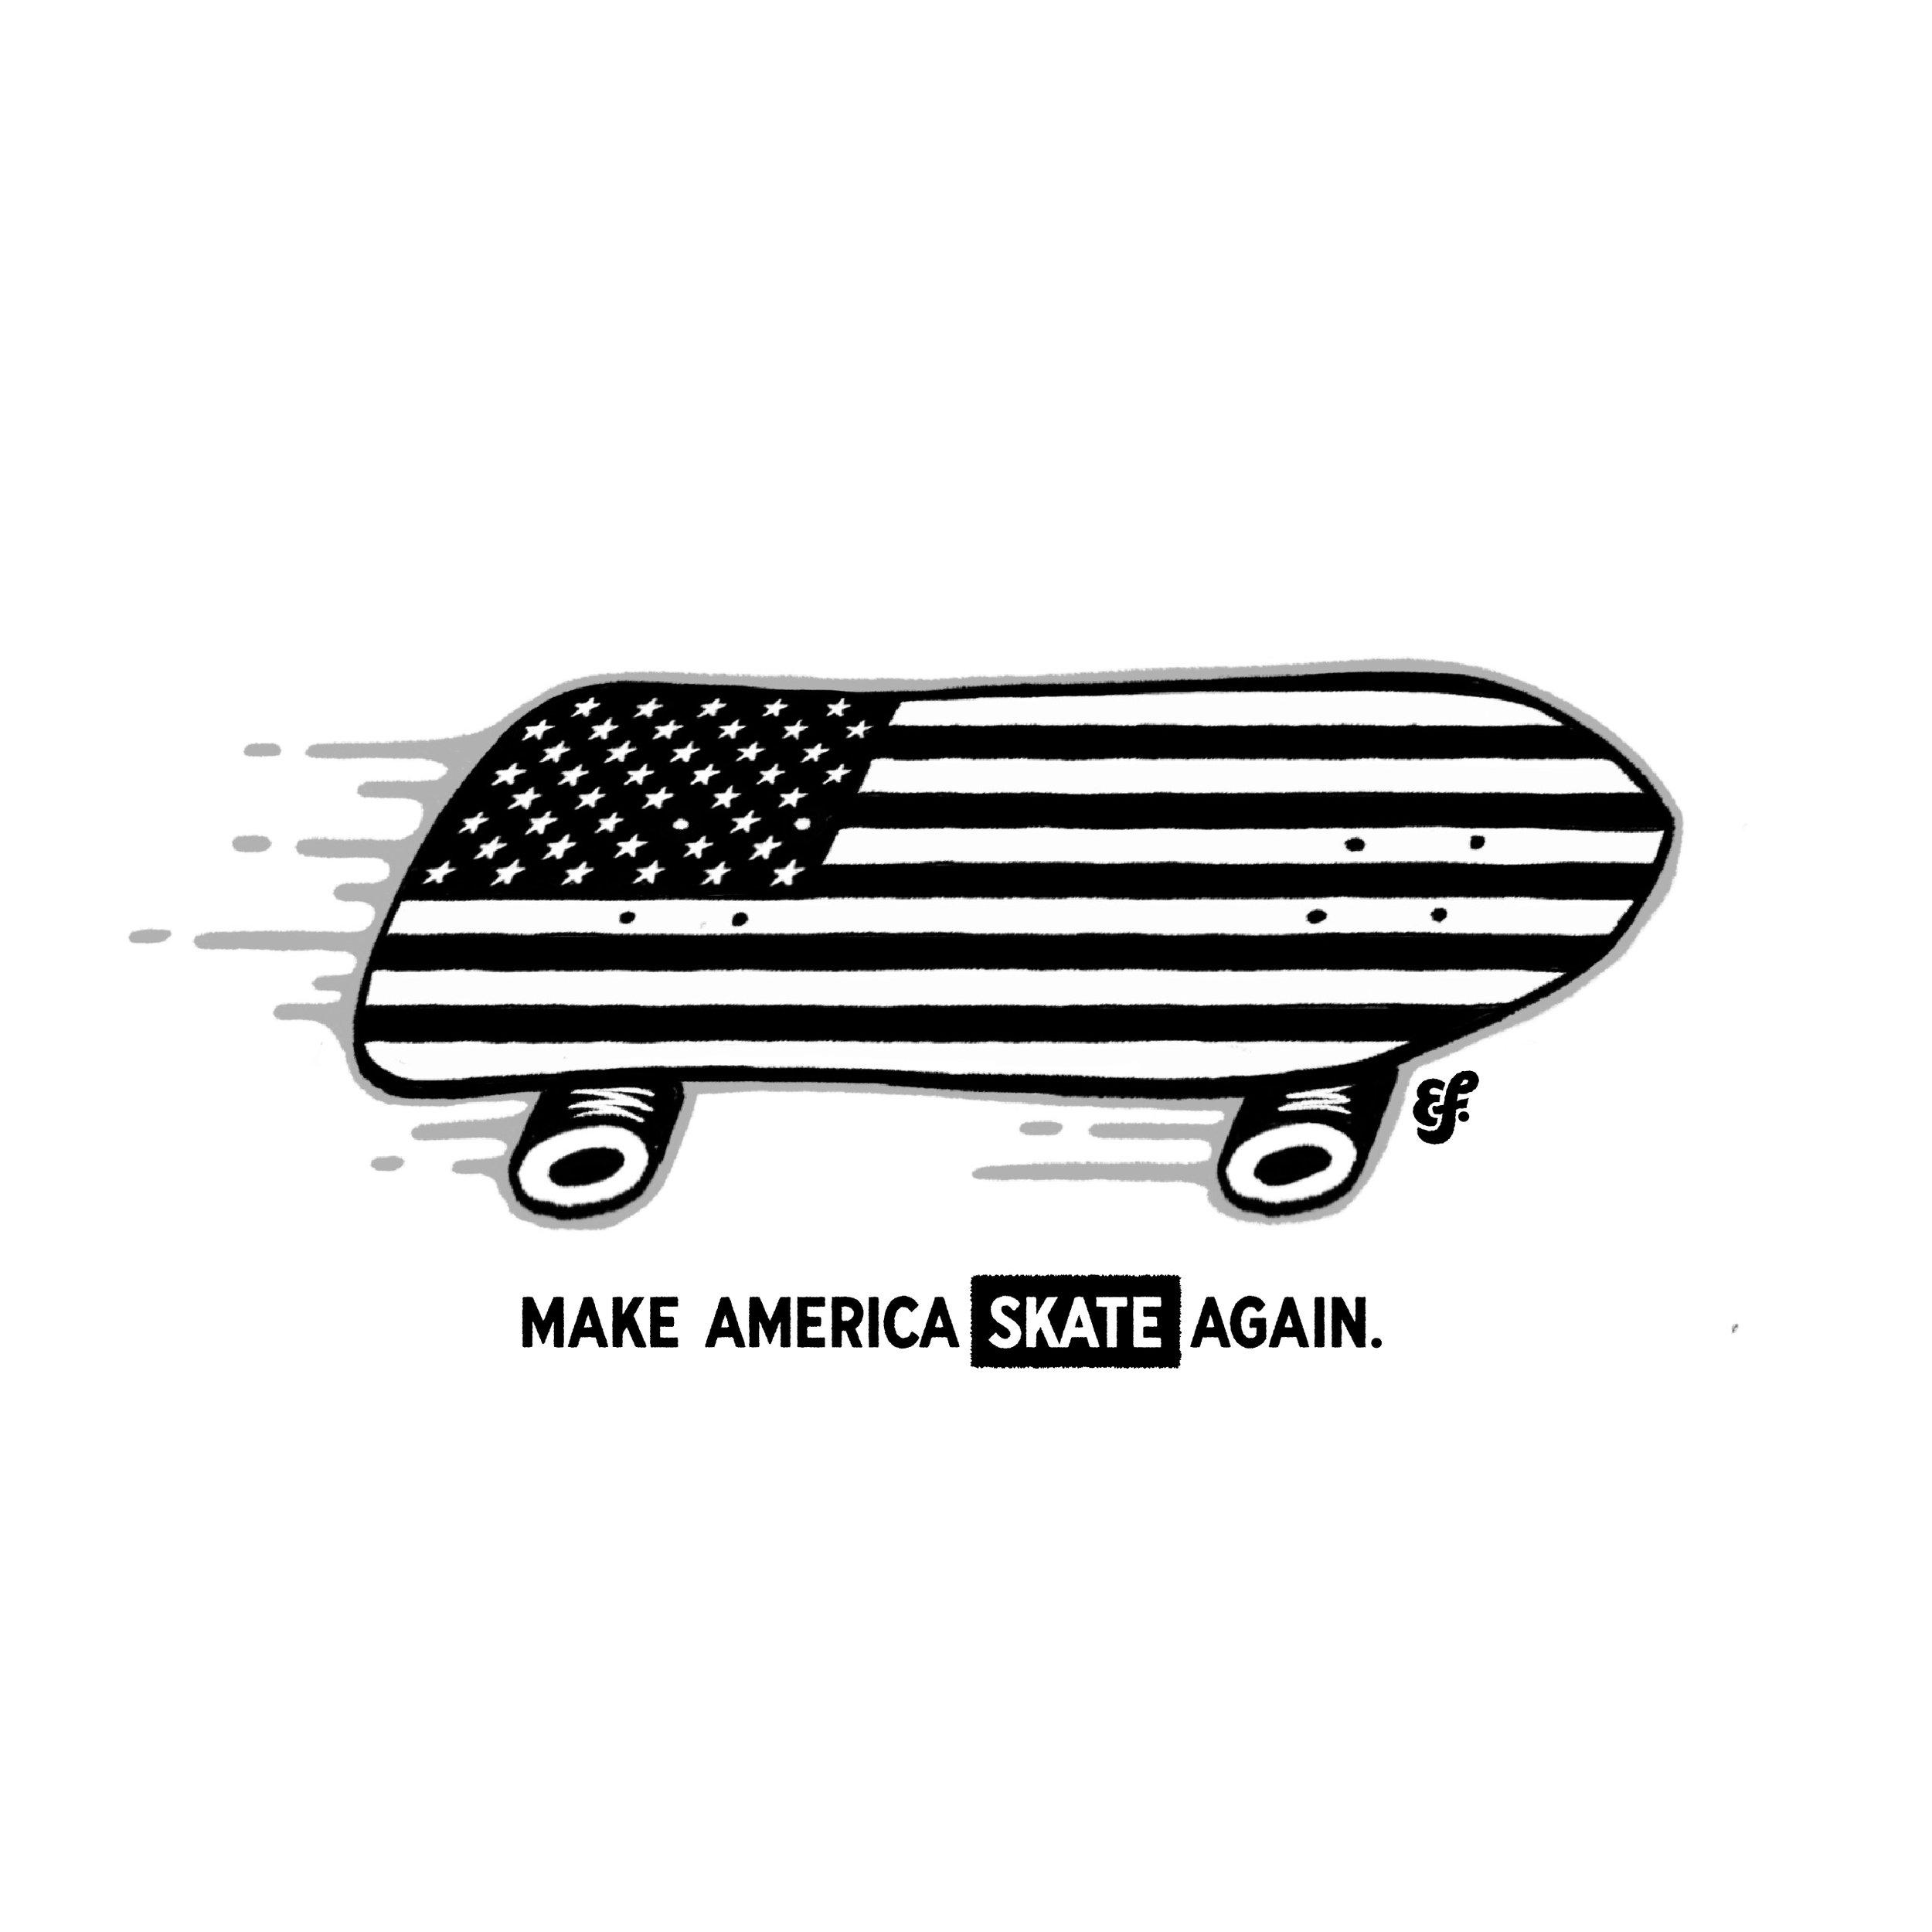 MakeAmericaSkateAgain-02.jpg